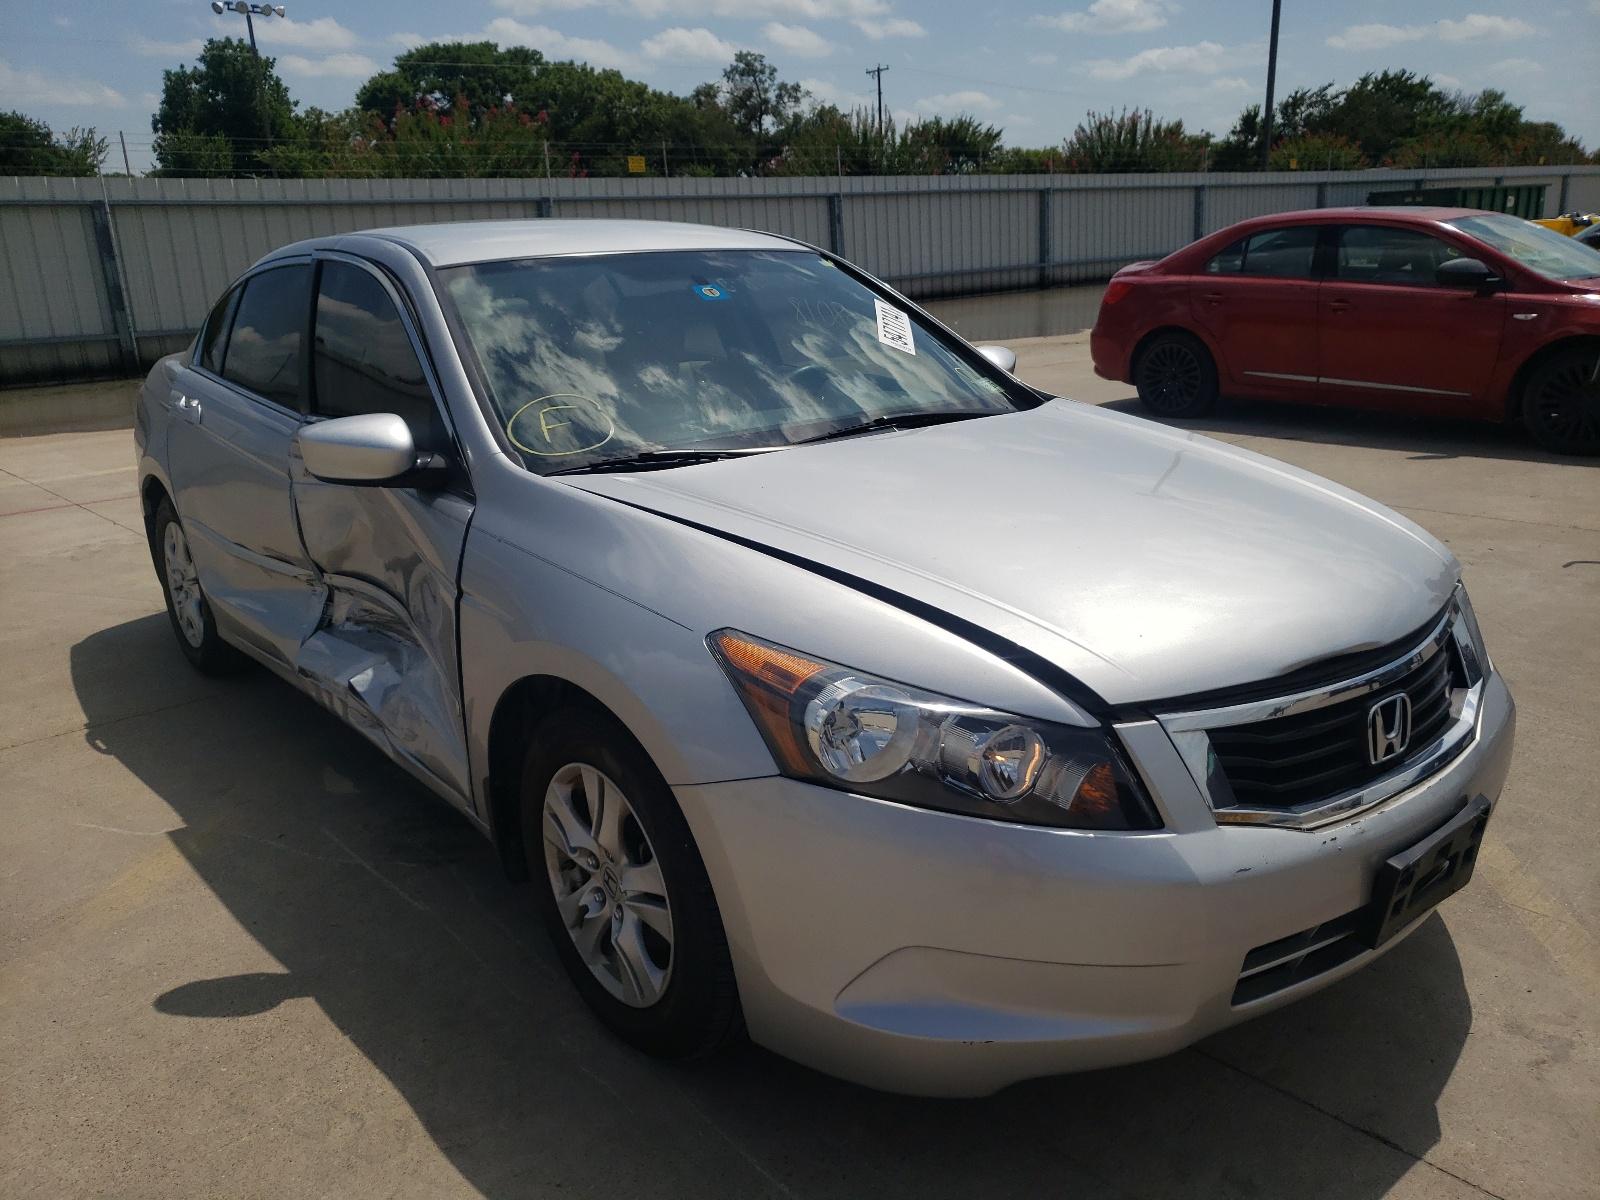 Honda Accord LXP 2010